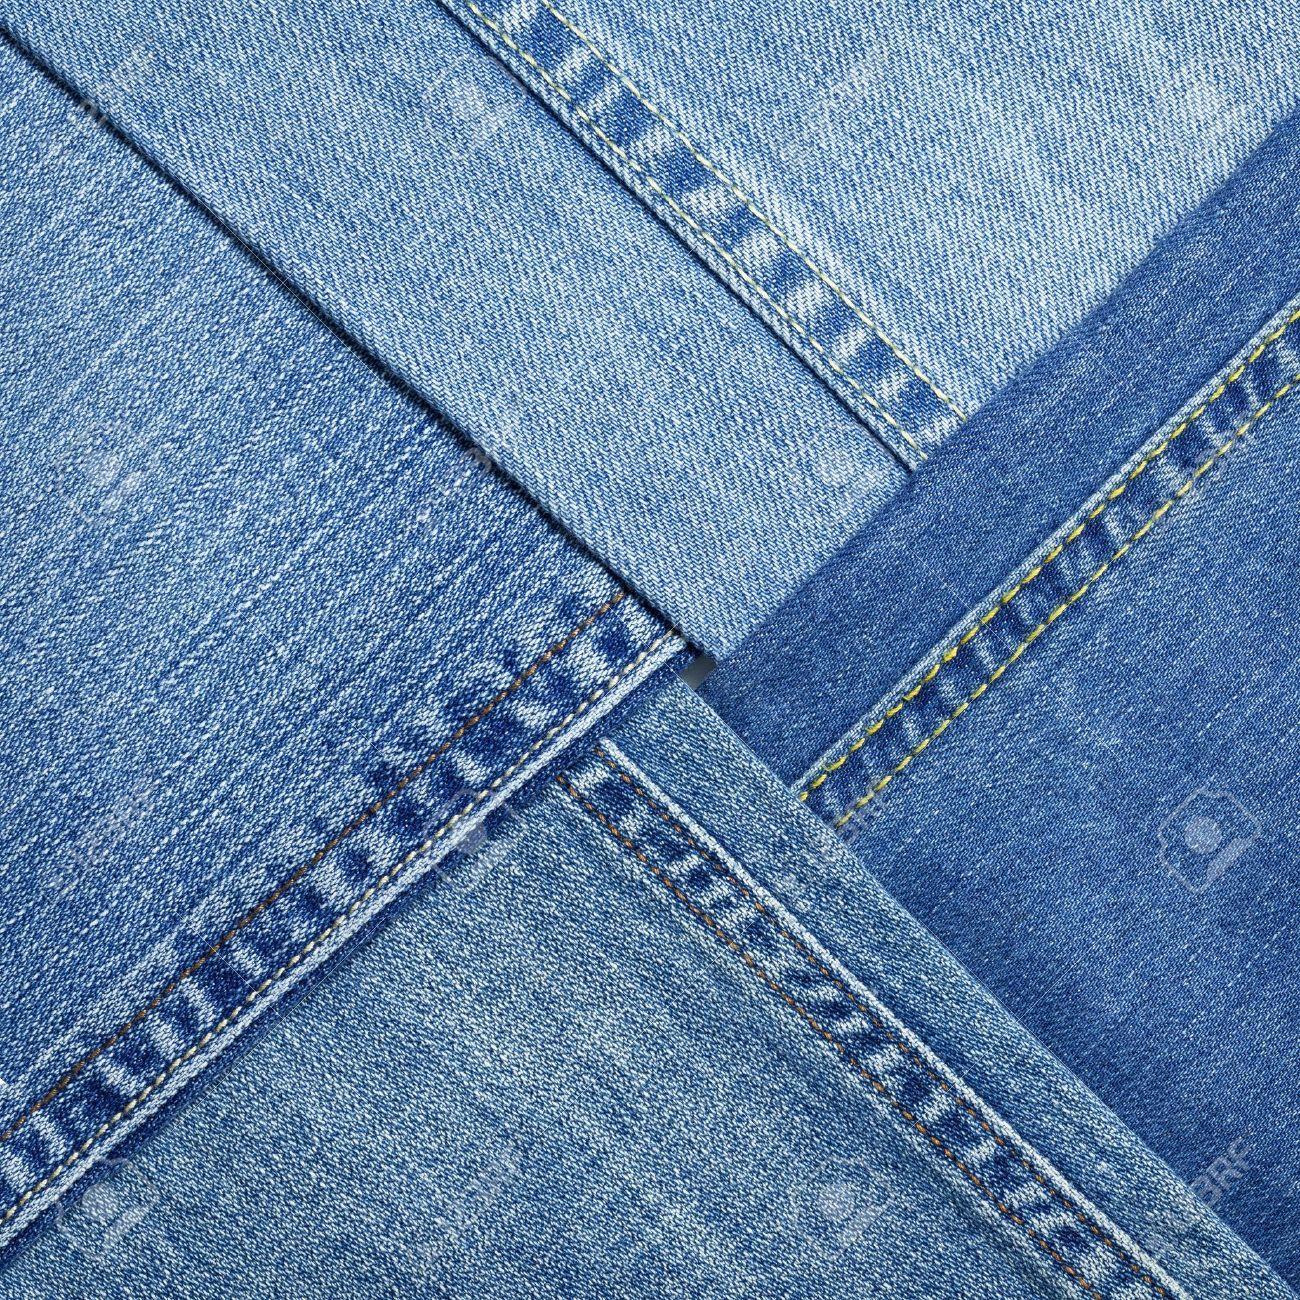 denim - Google 検索 | Denim | Pinterest | Photos, Trousers and ...